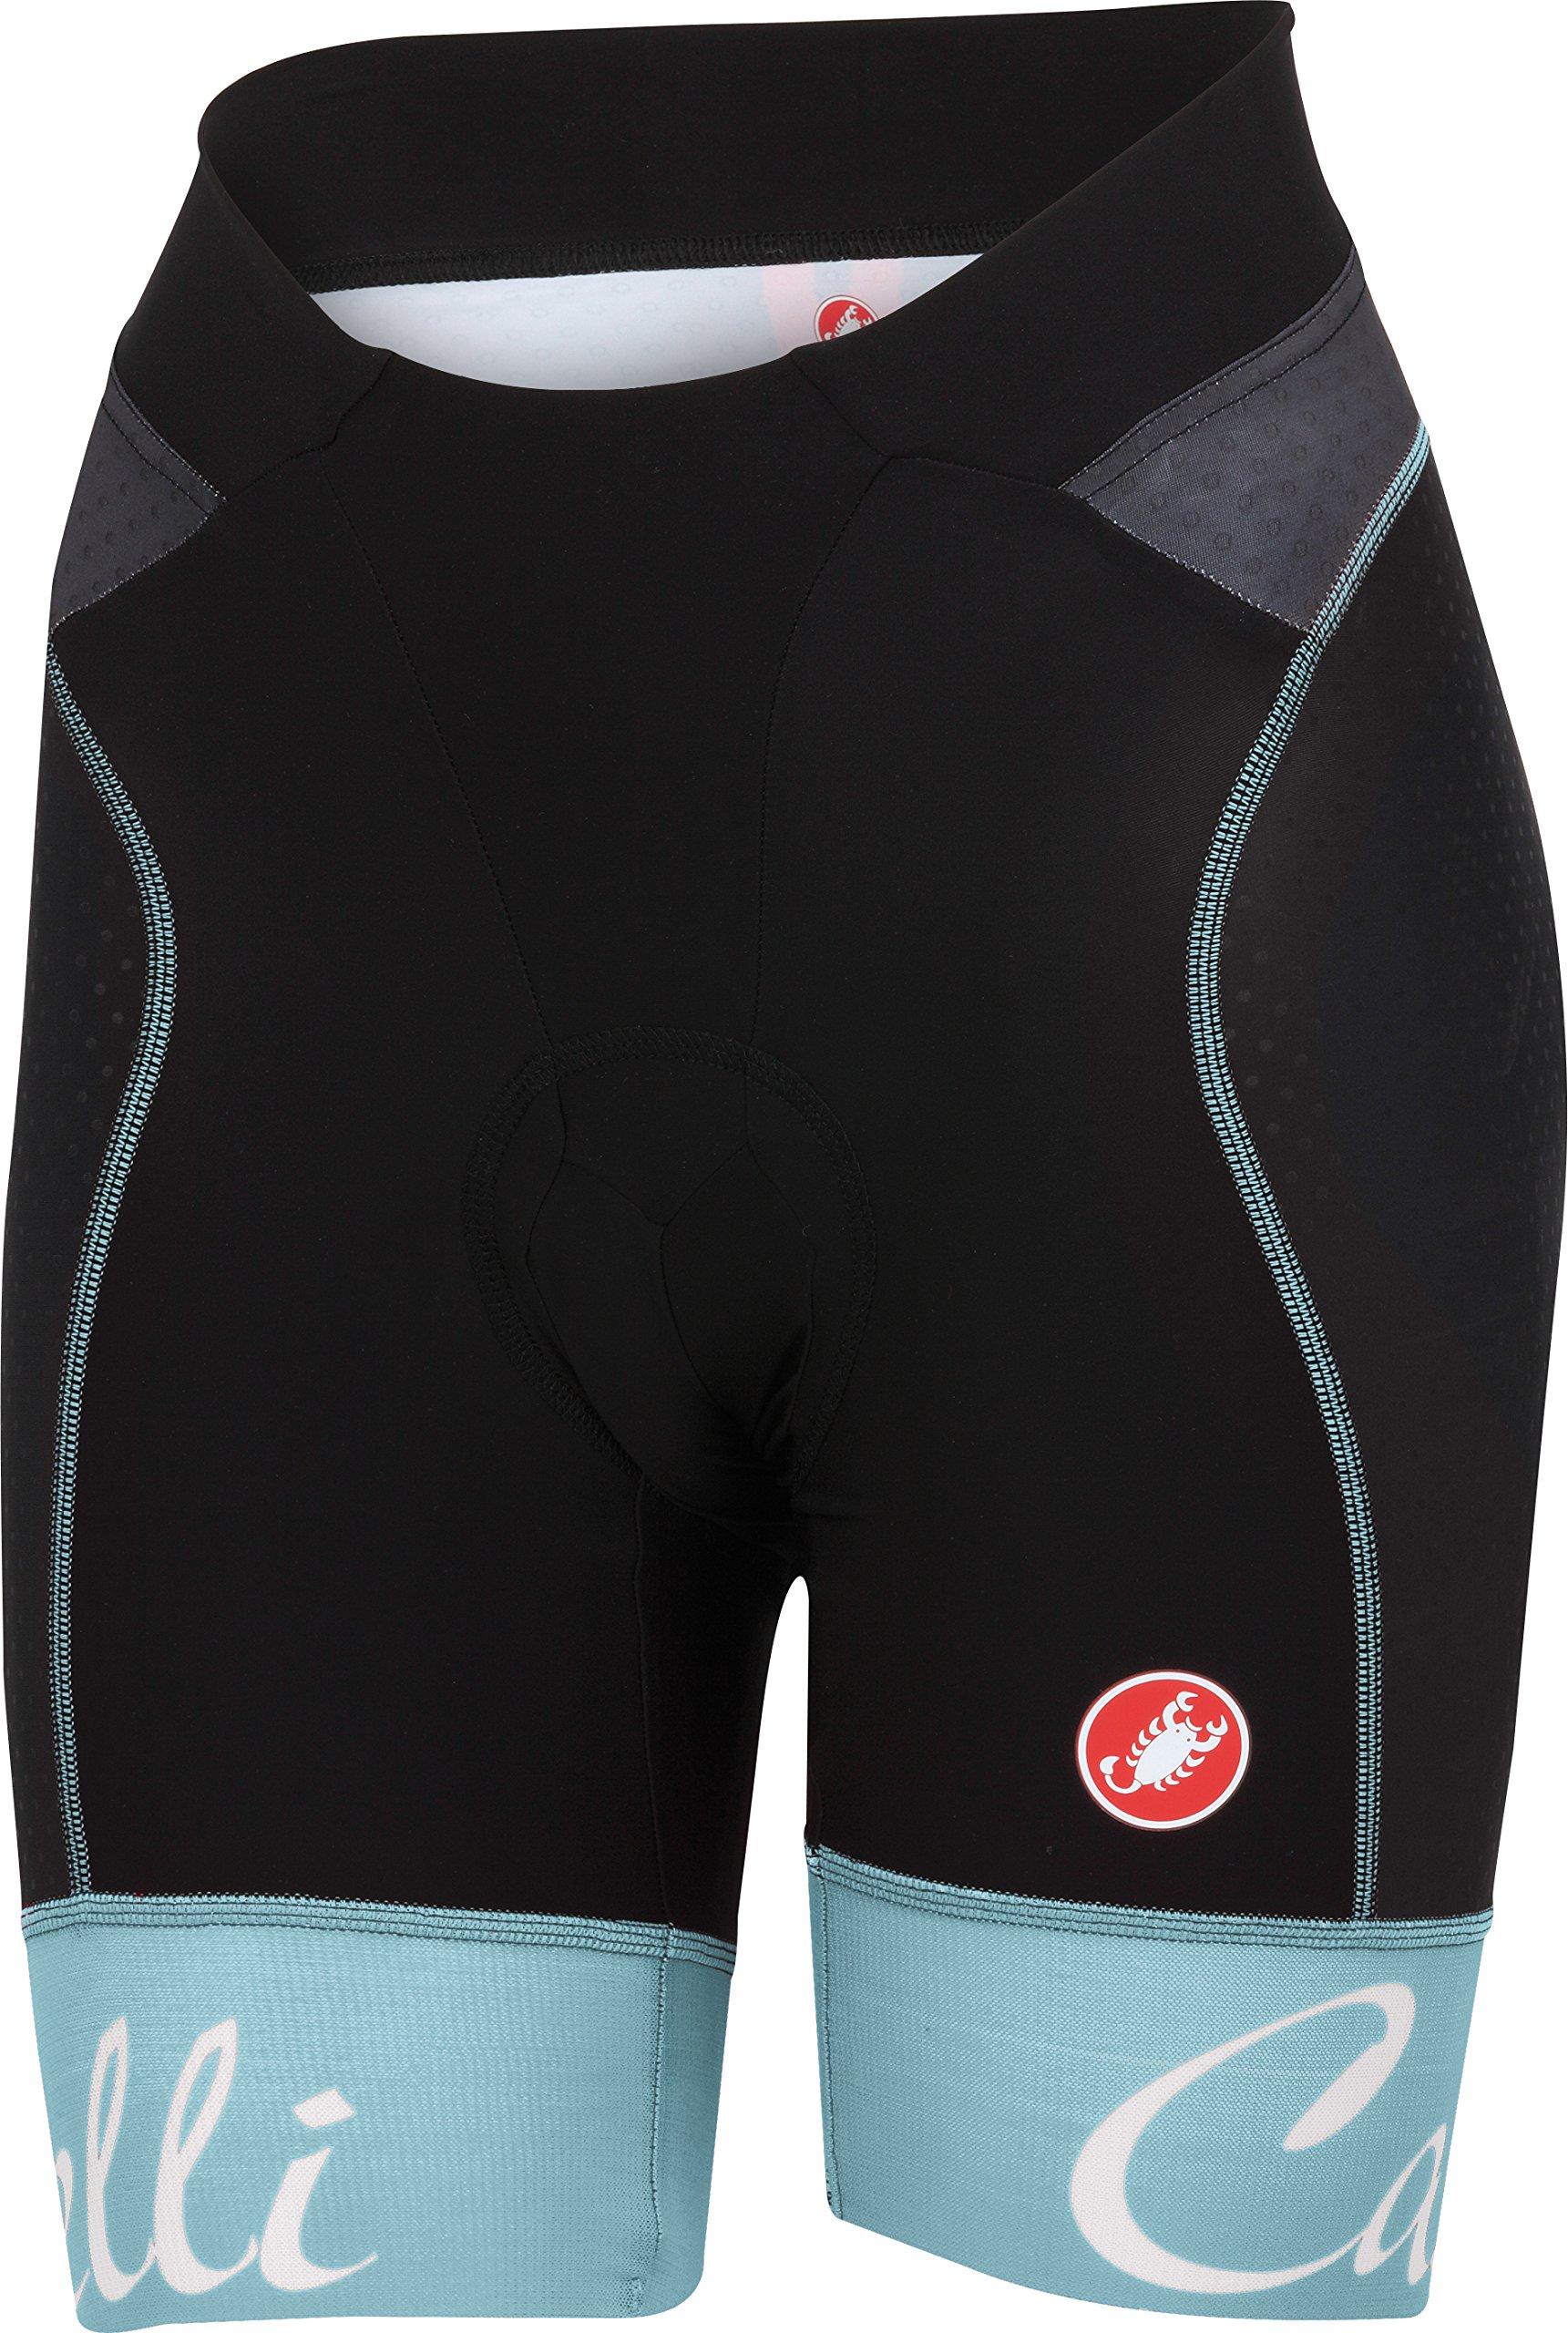 Castelli Free Aero W Short Black/Pale Blue Size XL by Castelli (Image #1)